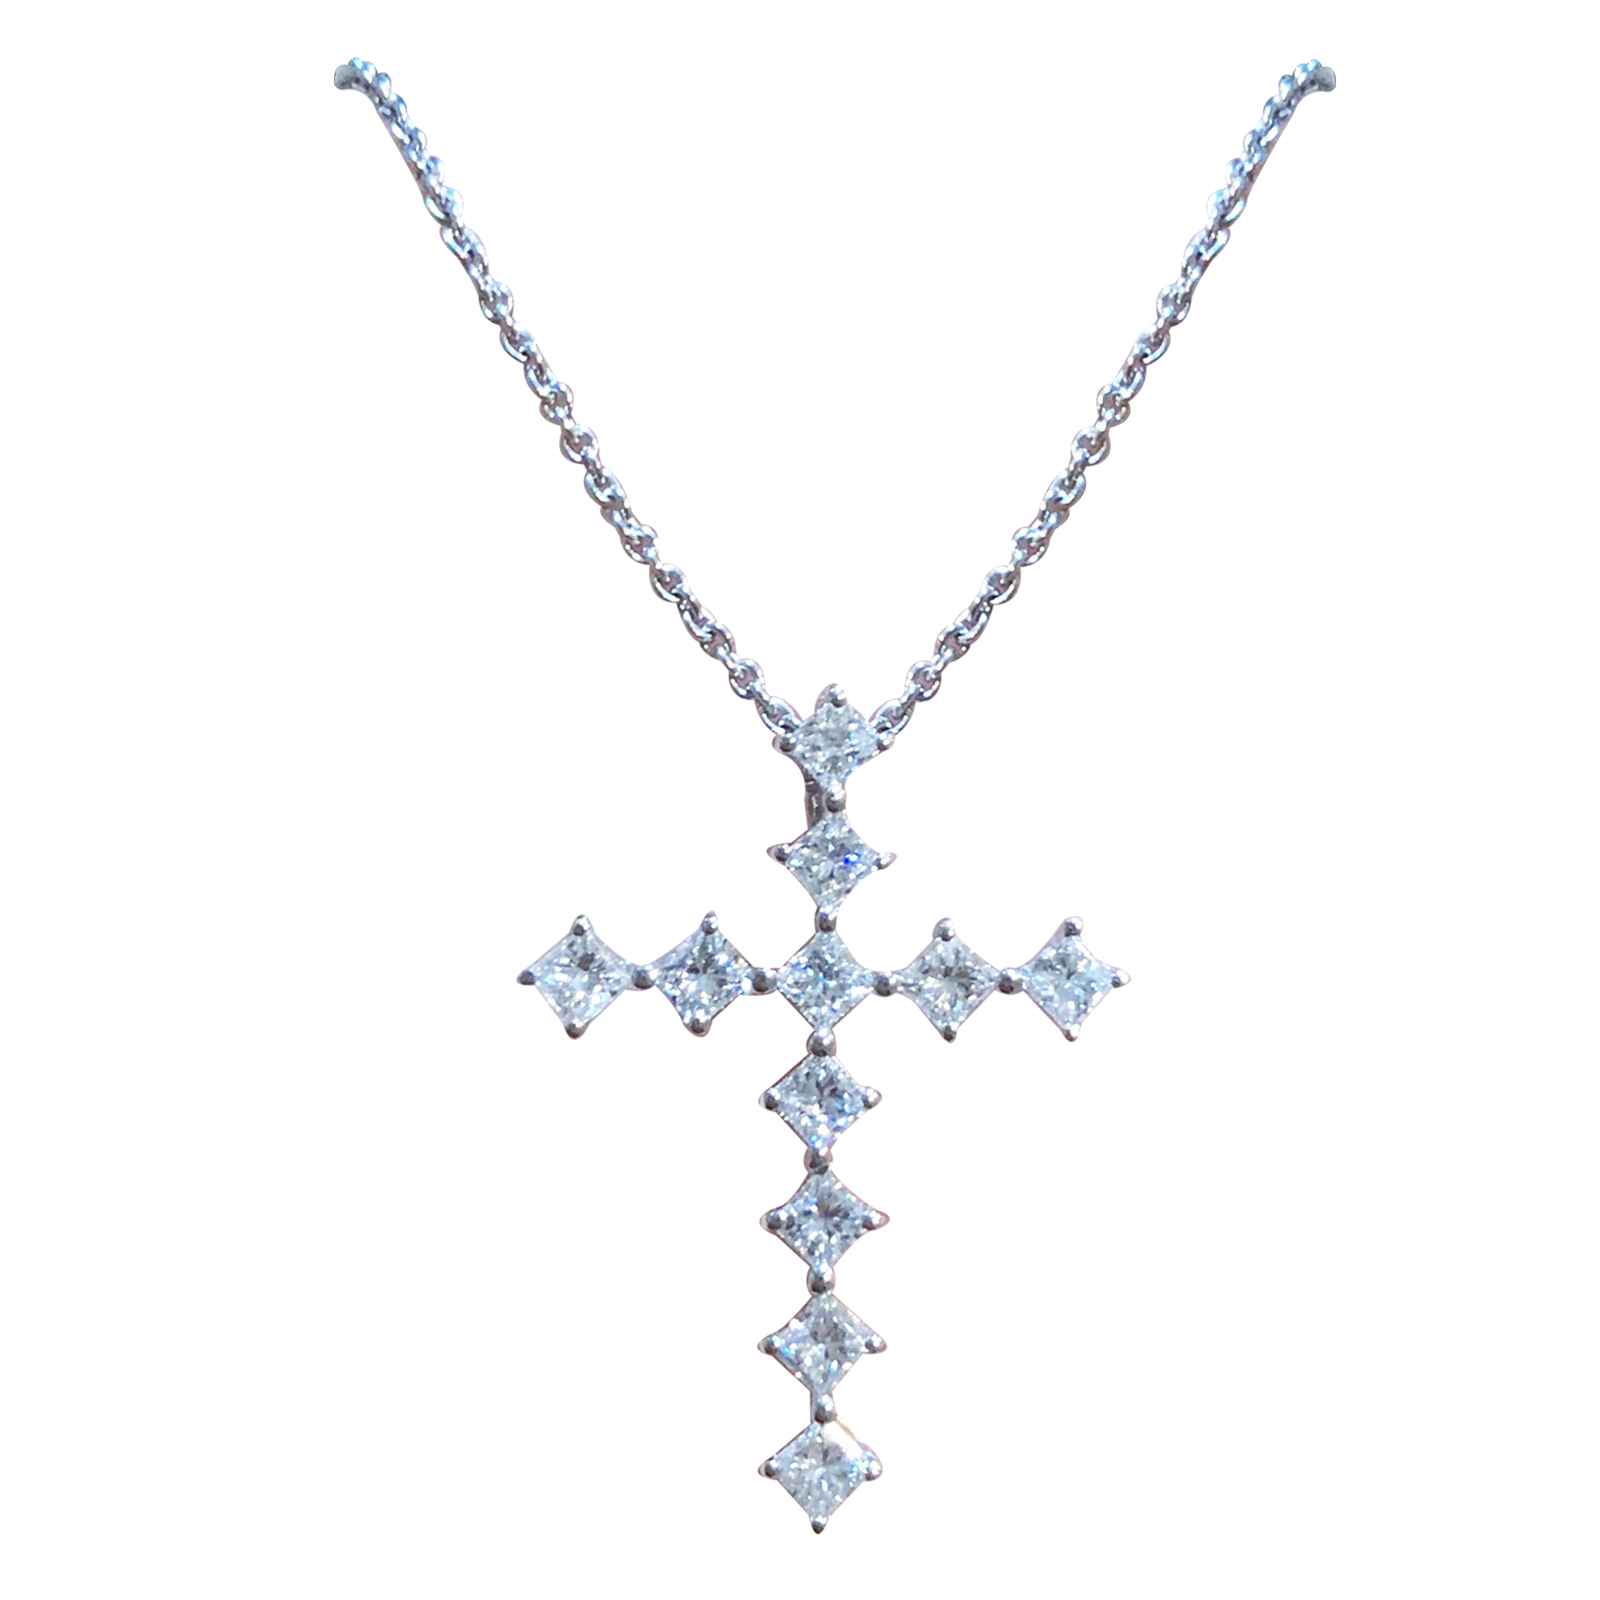 PRINCESS CUT DIAMOND CROSS NECKLACE BESPOKE FINE JEWELLERY BY SHAHINA HATTA